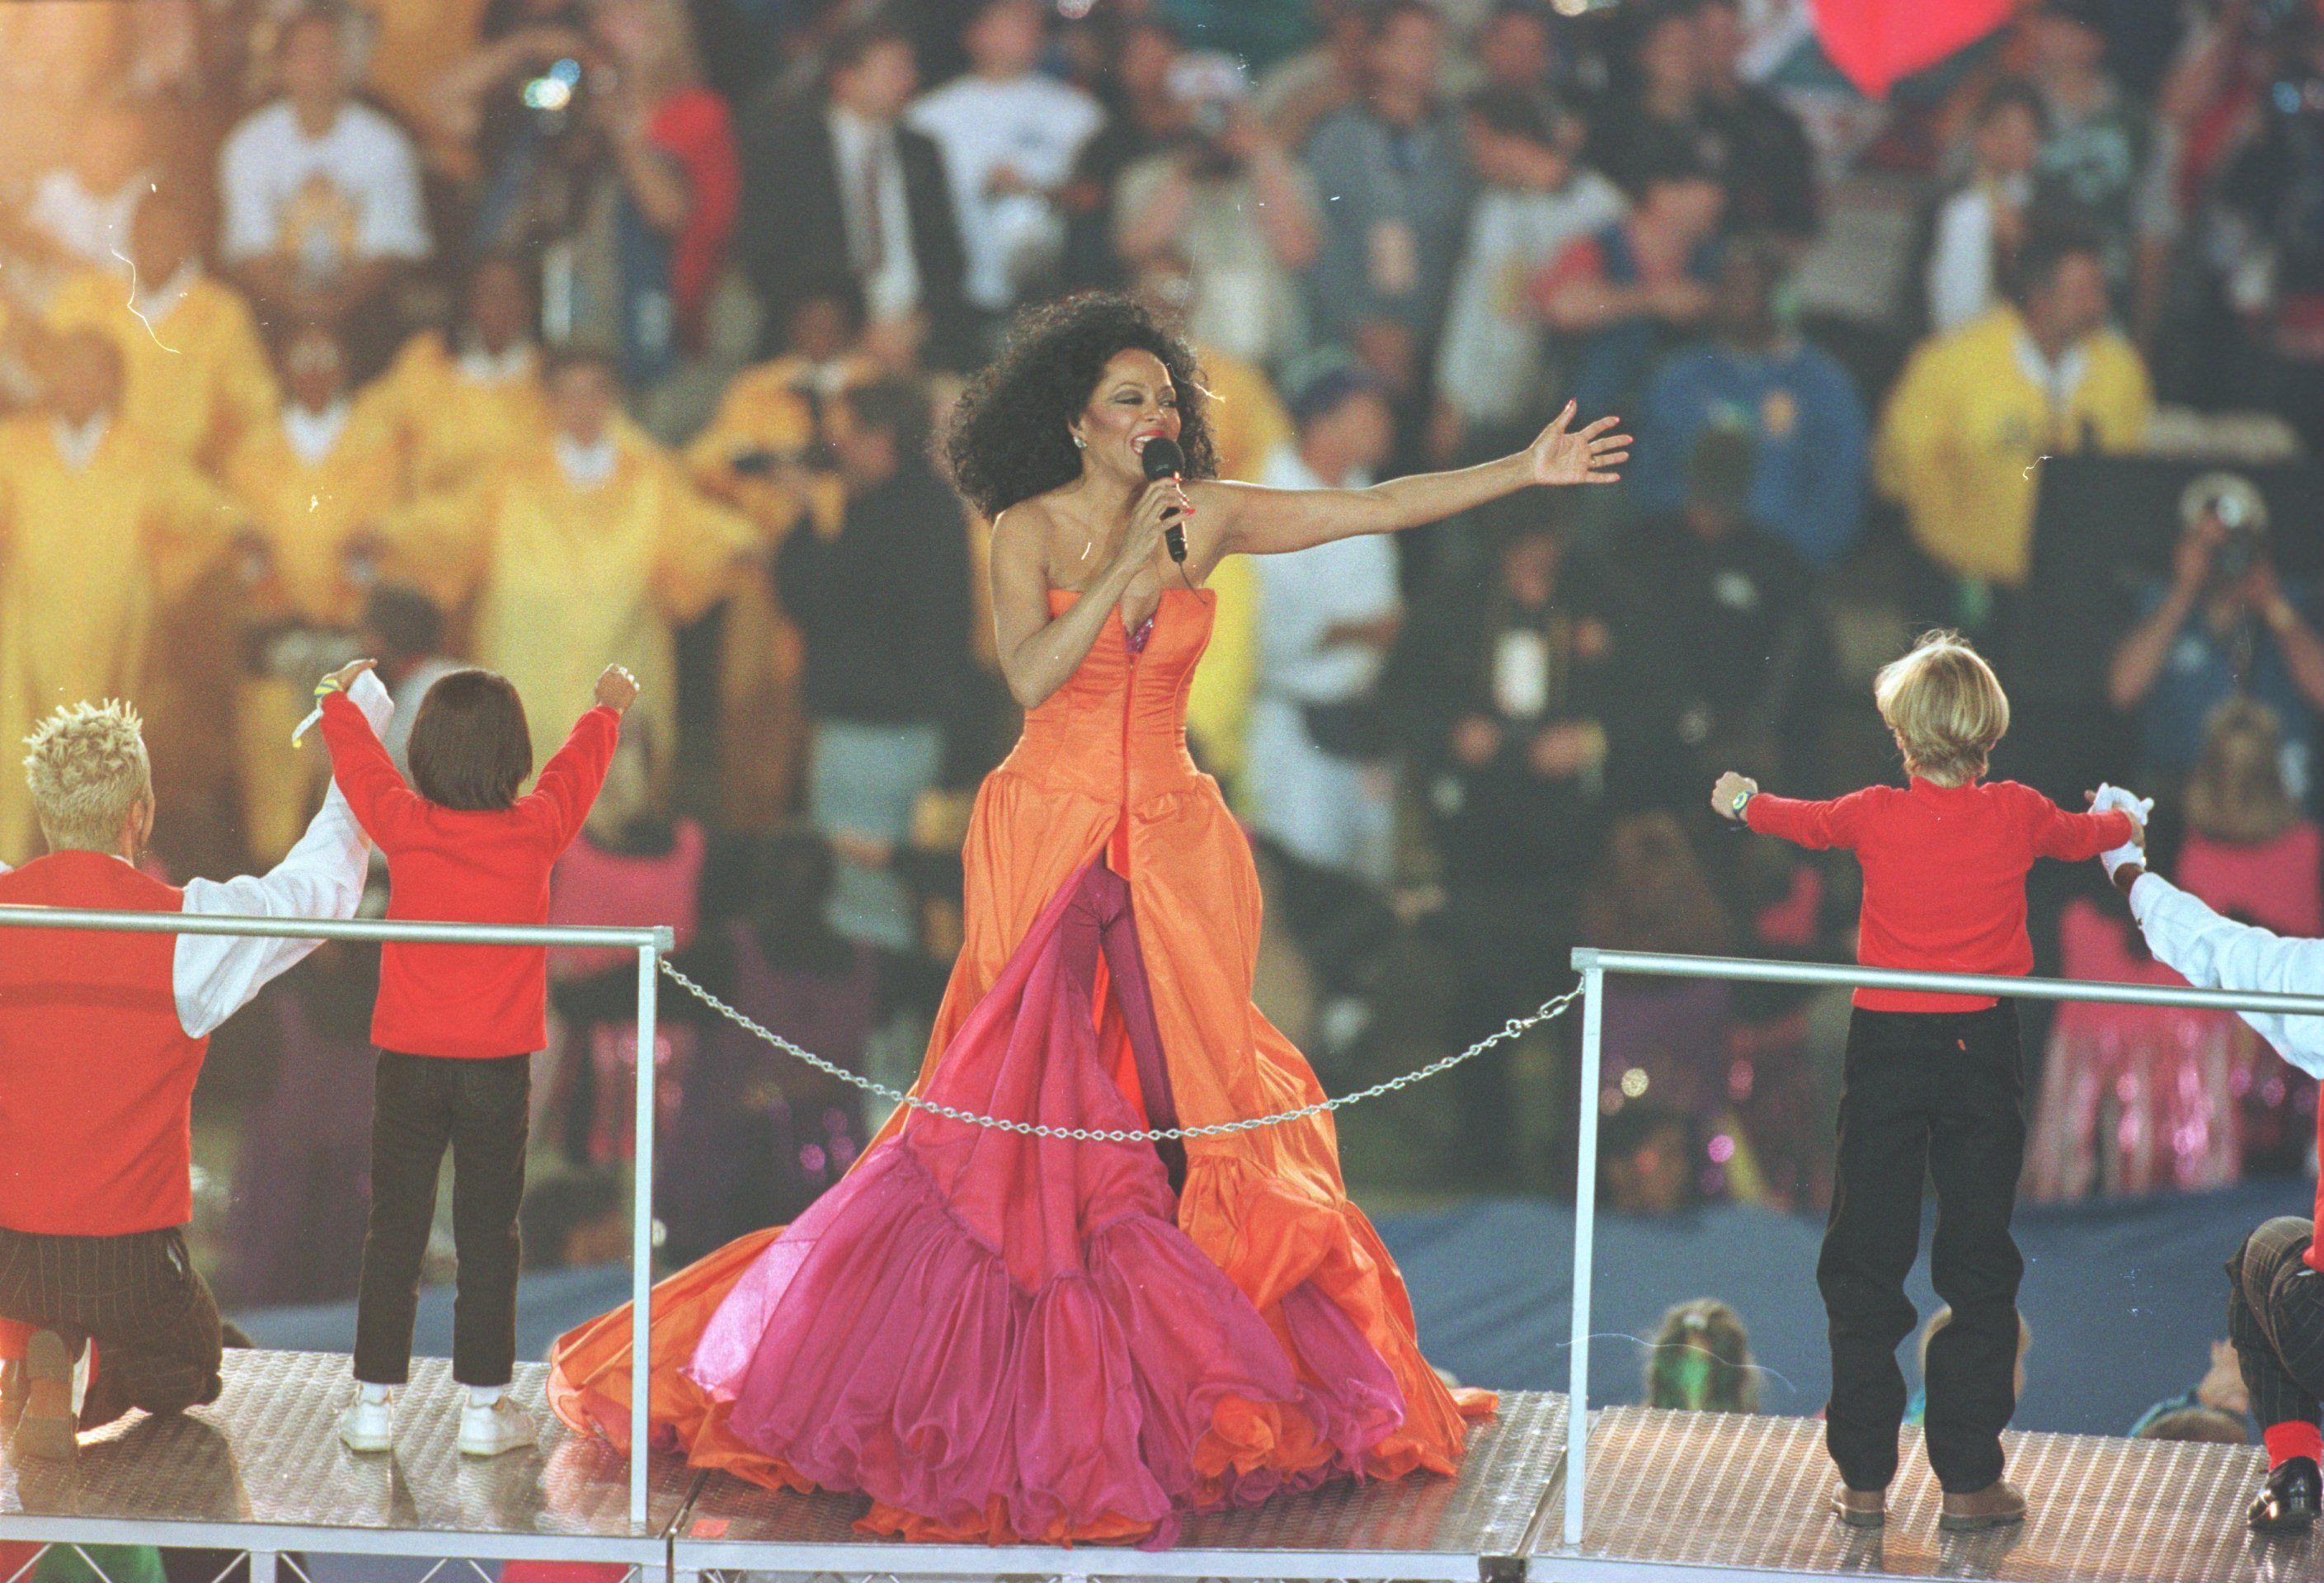 Super Bowl XXX: A Diva Delights the Crowd (1996)